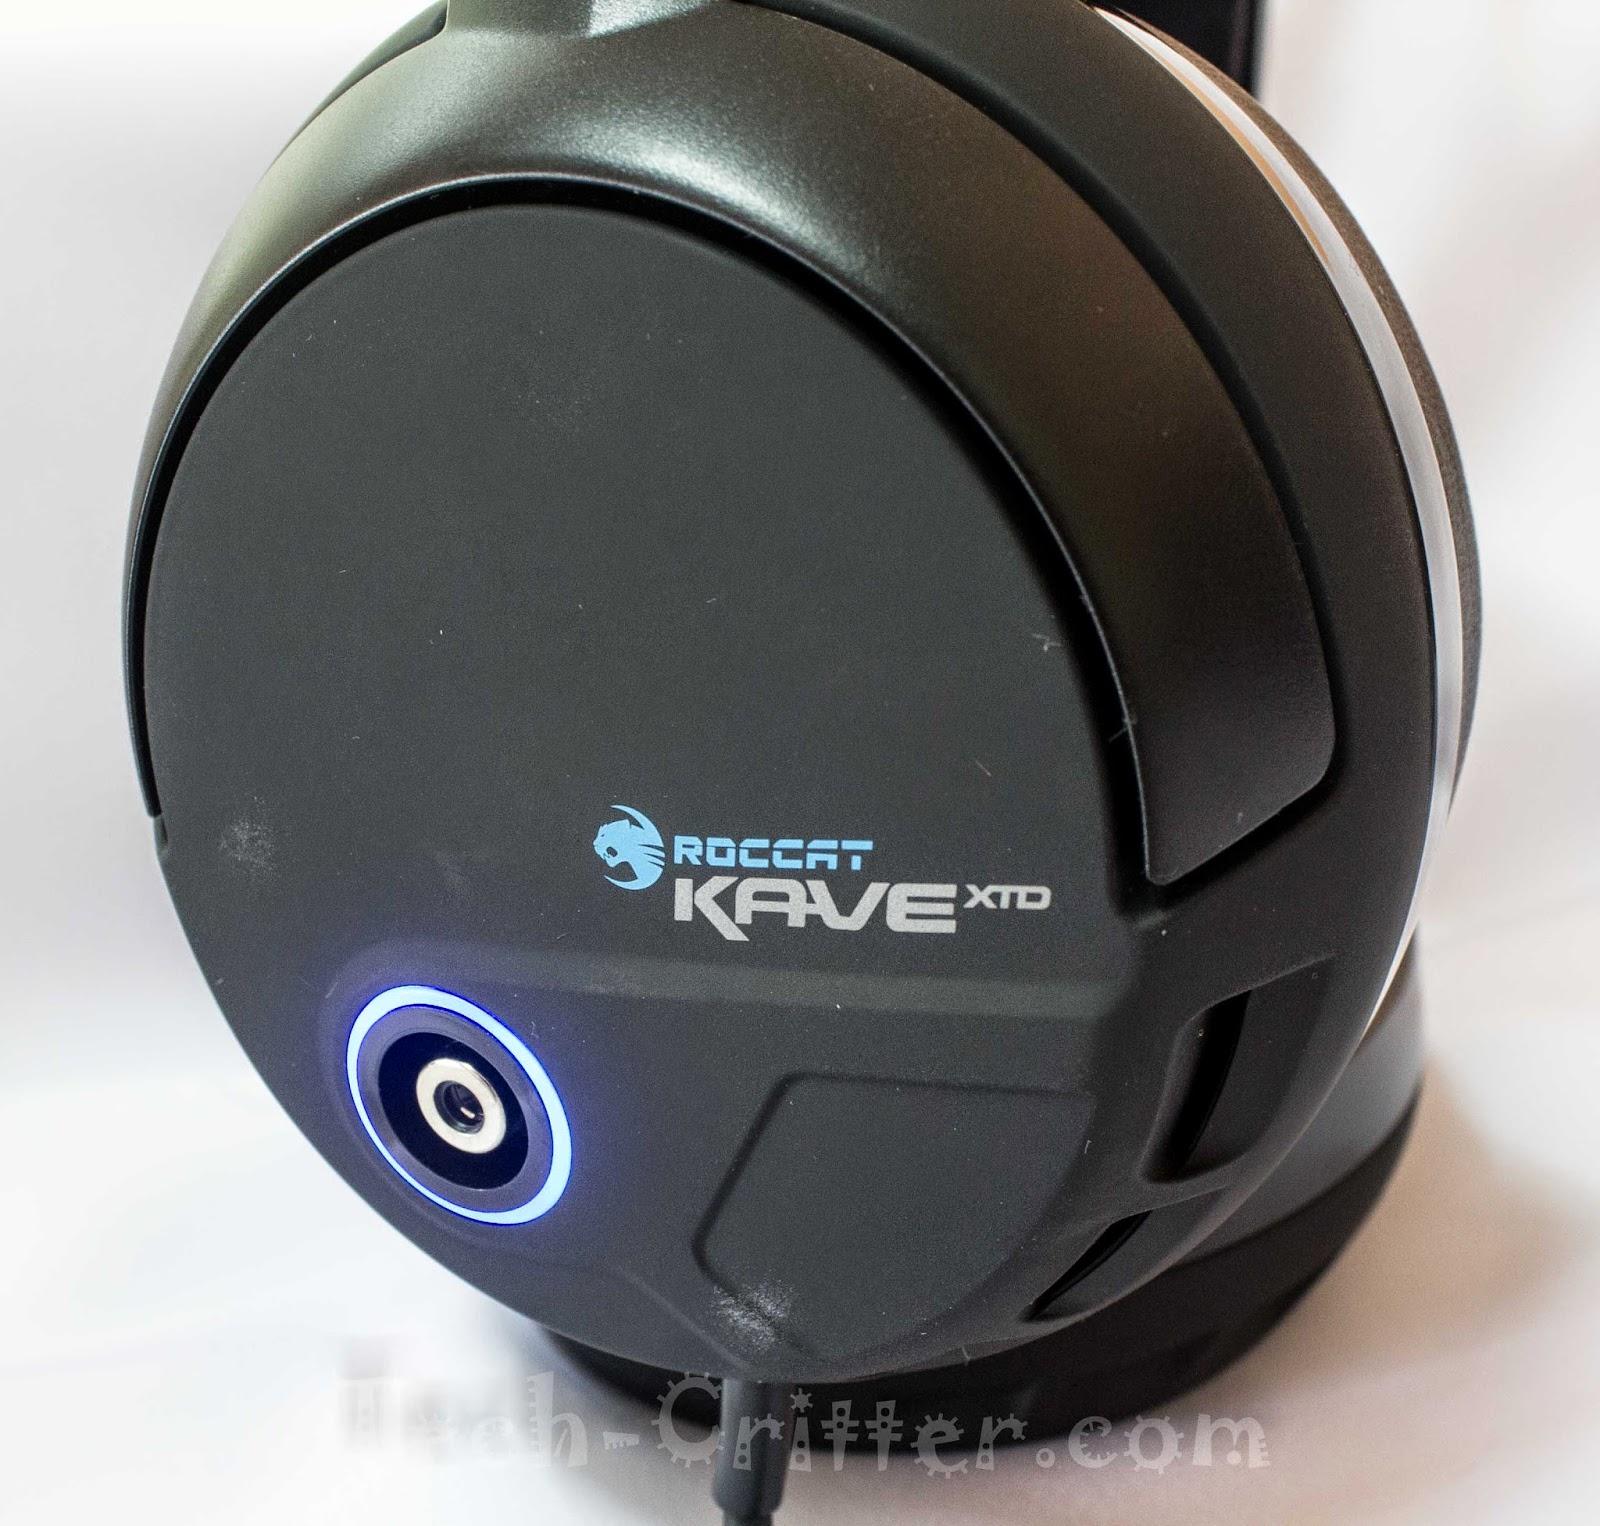 Unboxing & Review: Roccat Kave XTD 5.1 Digital Surround Sound Headset 67